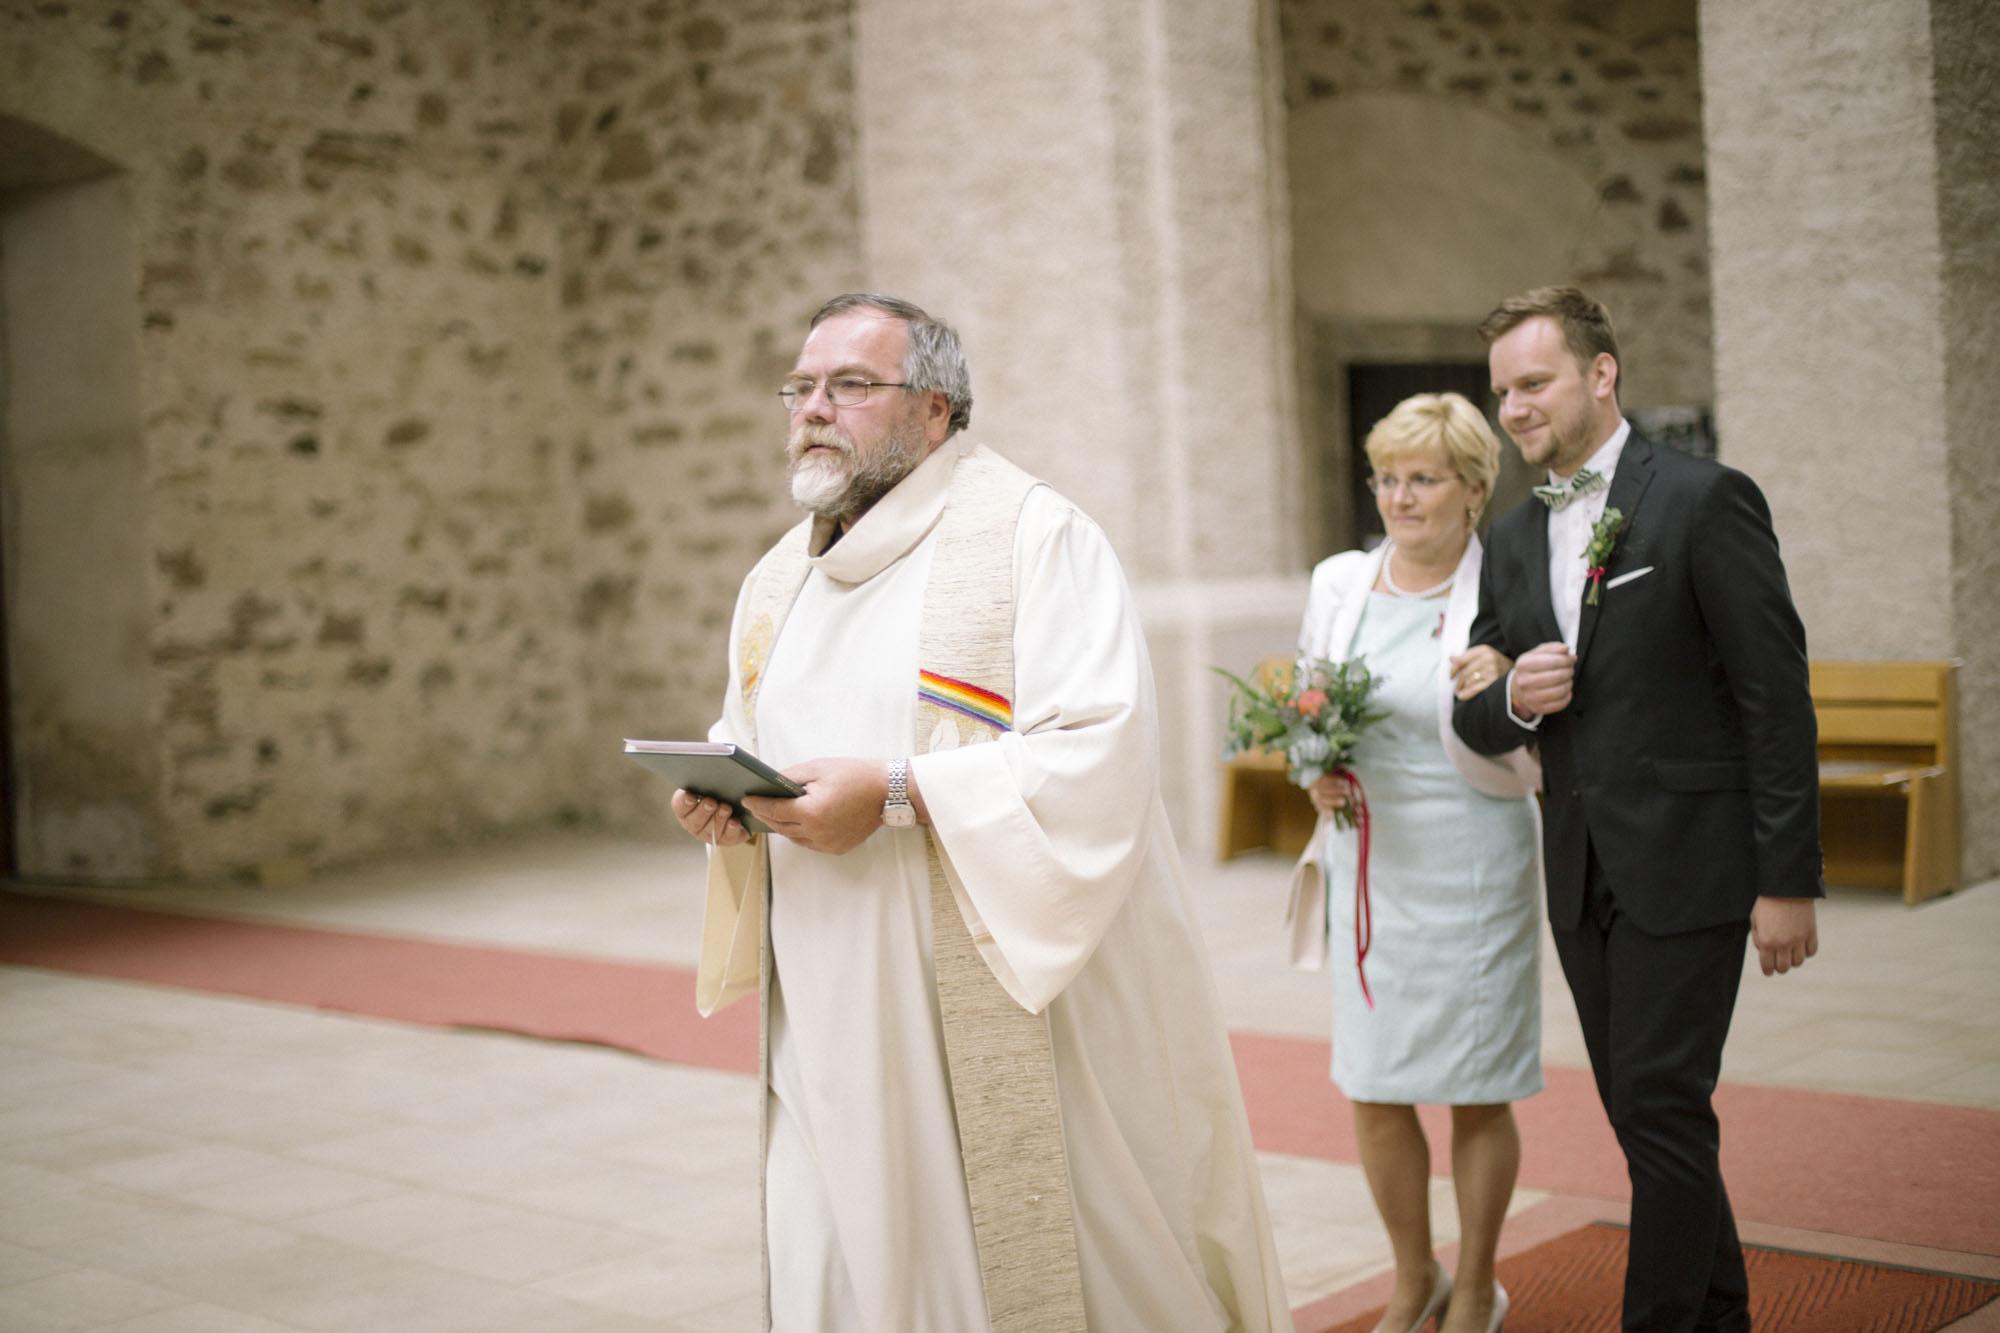 Wes Anderson inspired Bohemian Wedding in Czech Countryside Photography by Ceranna | Czech Weddding Photographer | Boho Bride | Neratov svatba